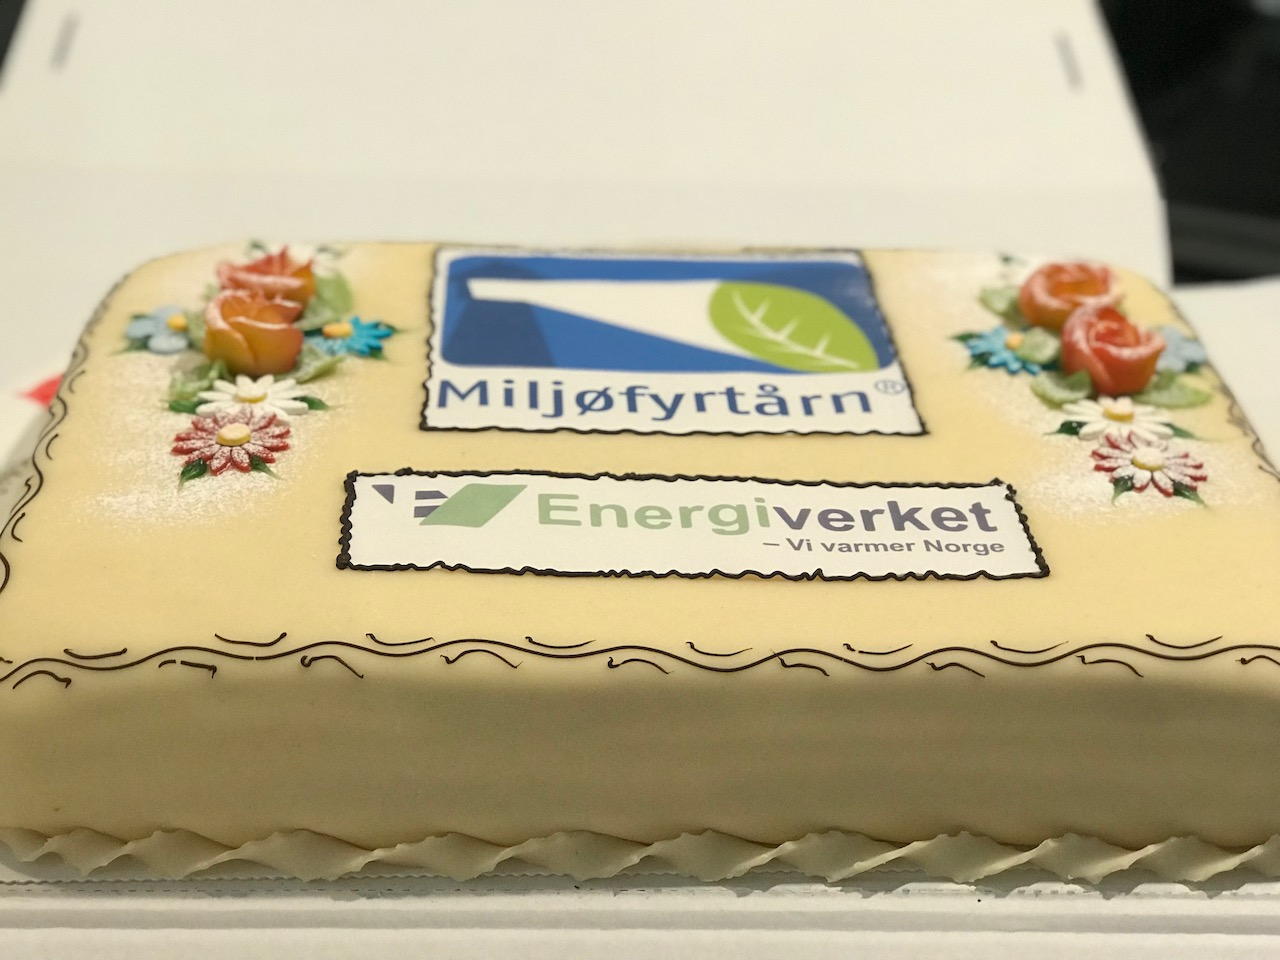 Miljøfyrtårn-Kake måtte vi ha som seg hør og bør